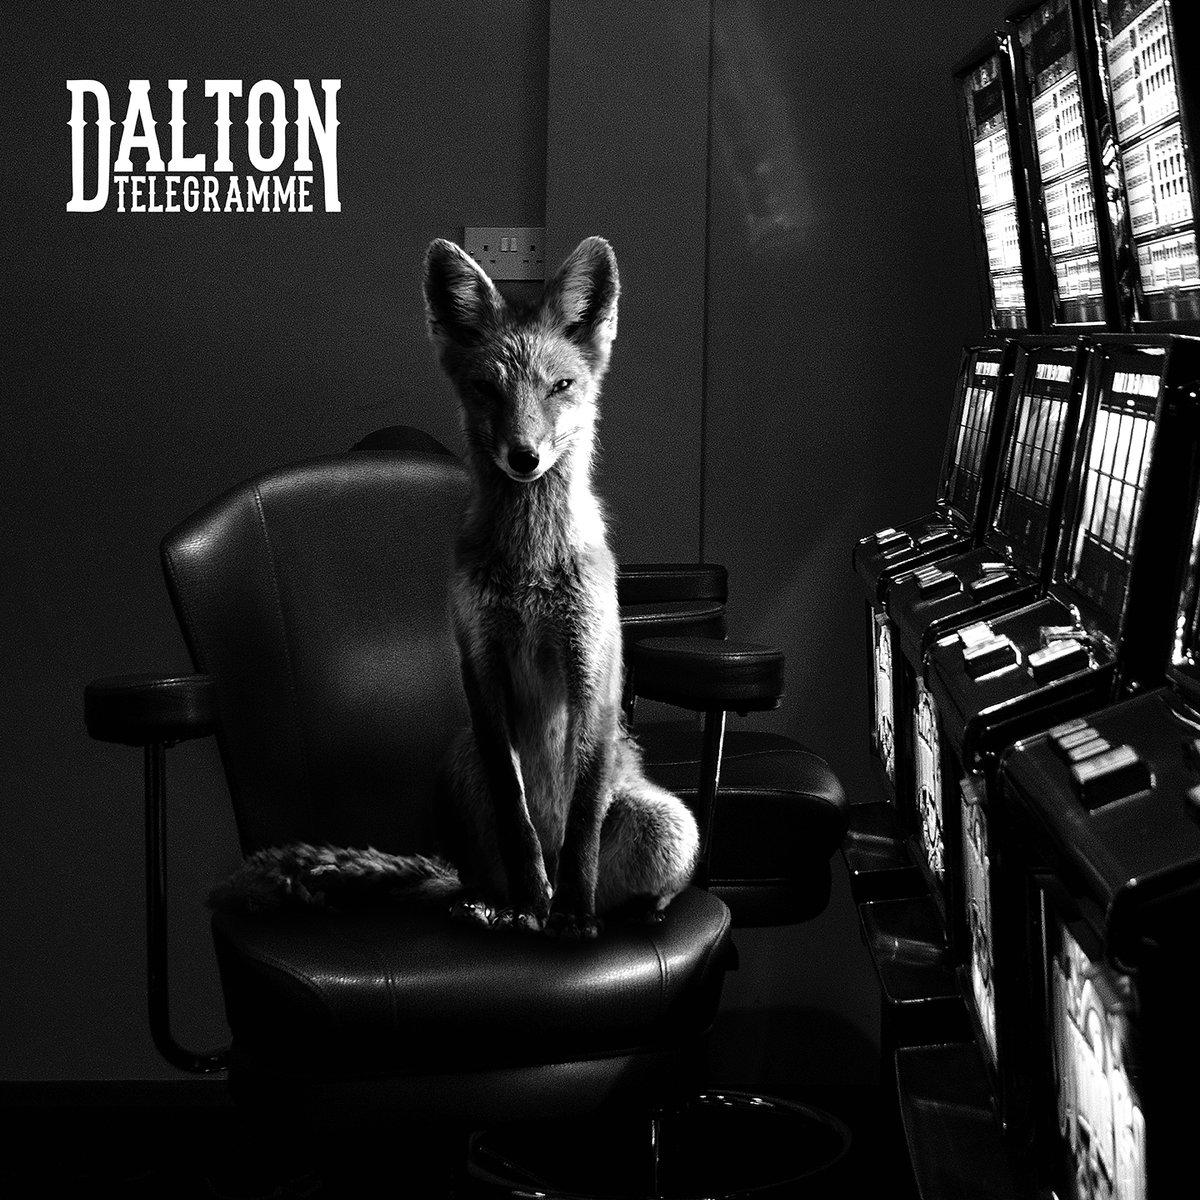 Dalton Telegramme - Sous la fourrure